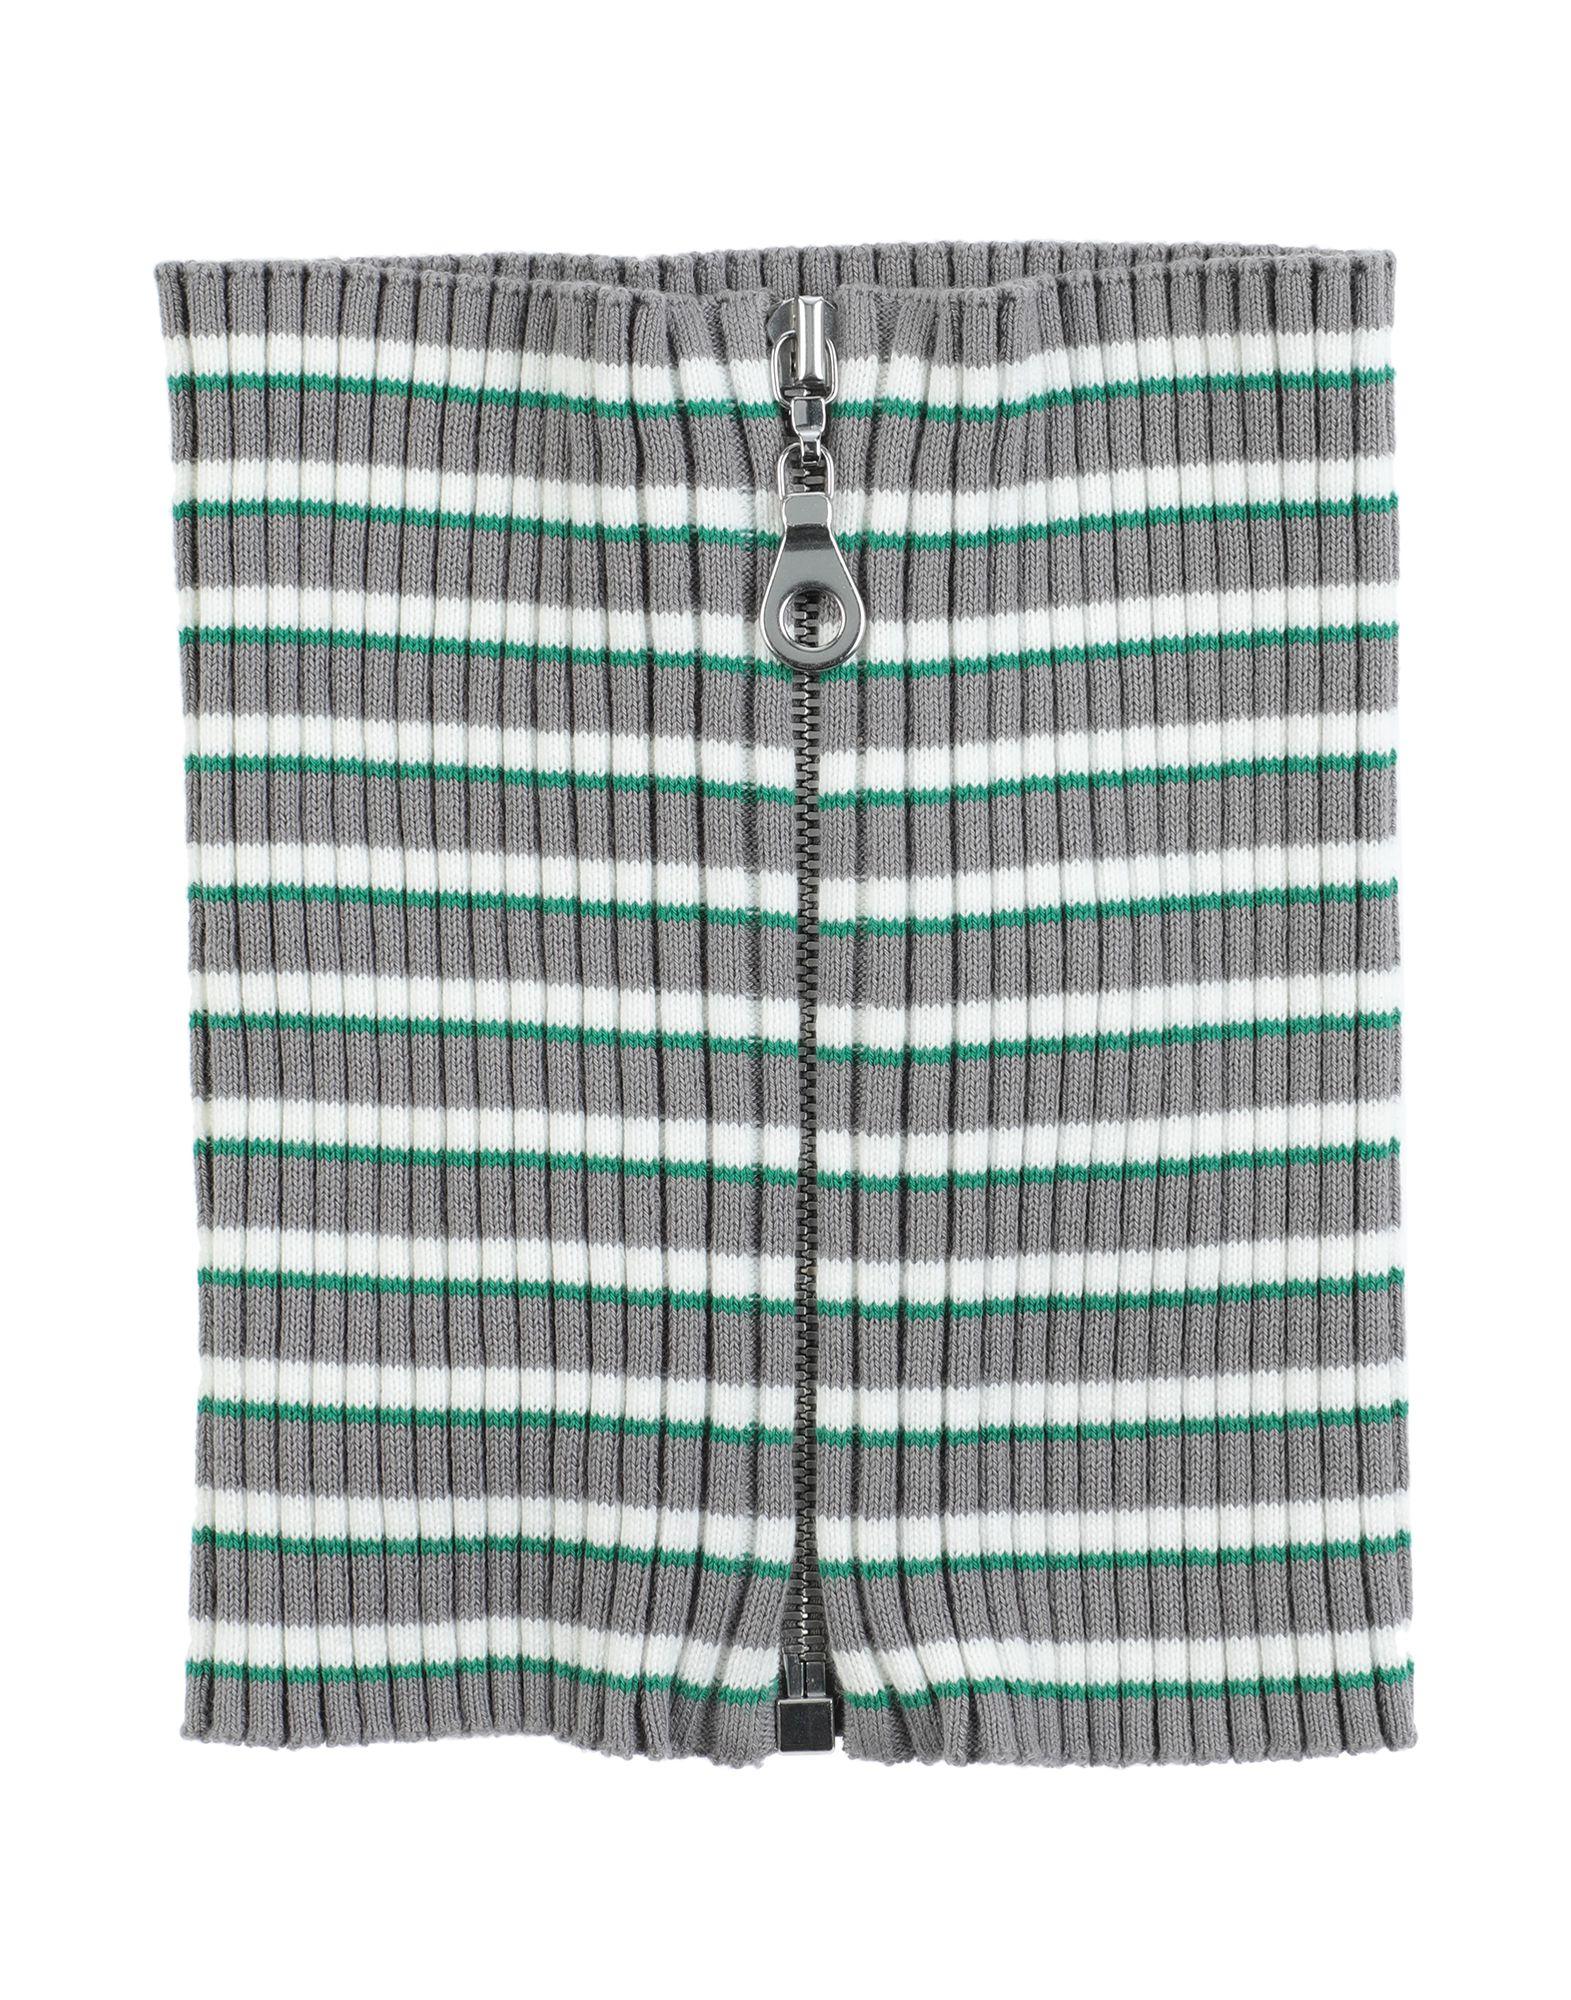 MAISON MARGIELA Collars. jersey, ribbed, no appliqués, stripes, zip. 100% Cotton